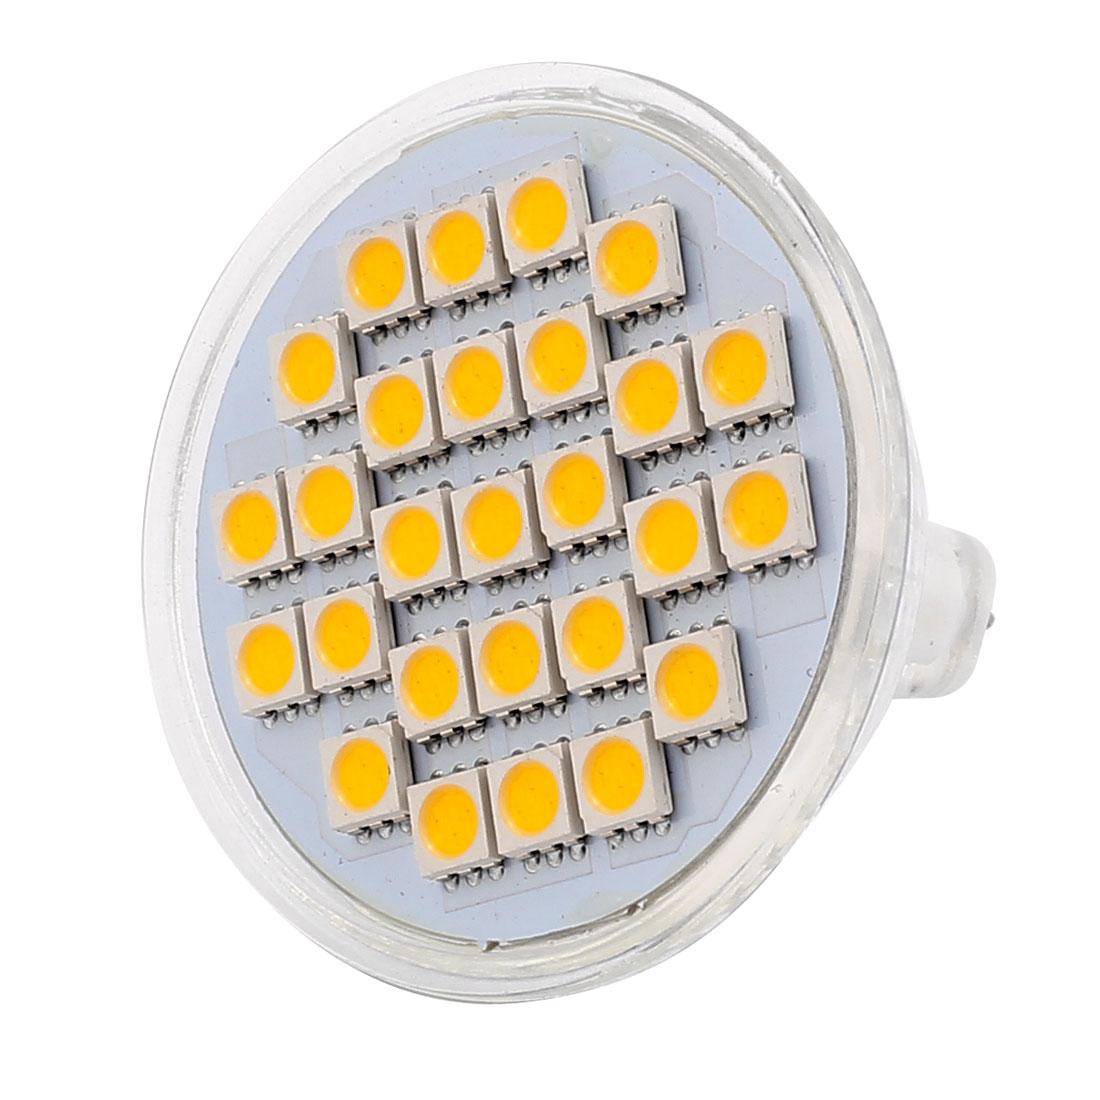 MR16 SMD5050 27LEDs AC 220V 4W Glass Energy Saving LED Lamp Bulb Warm White